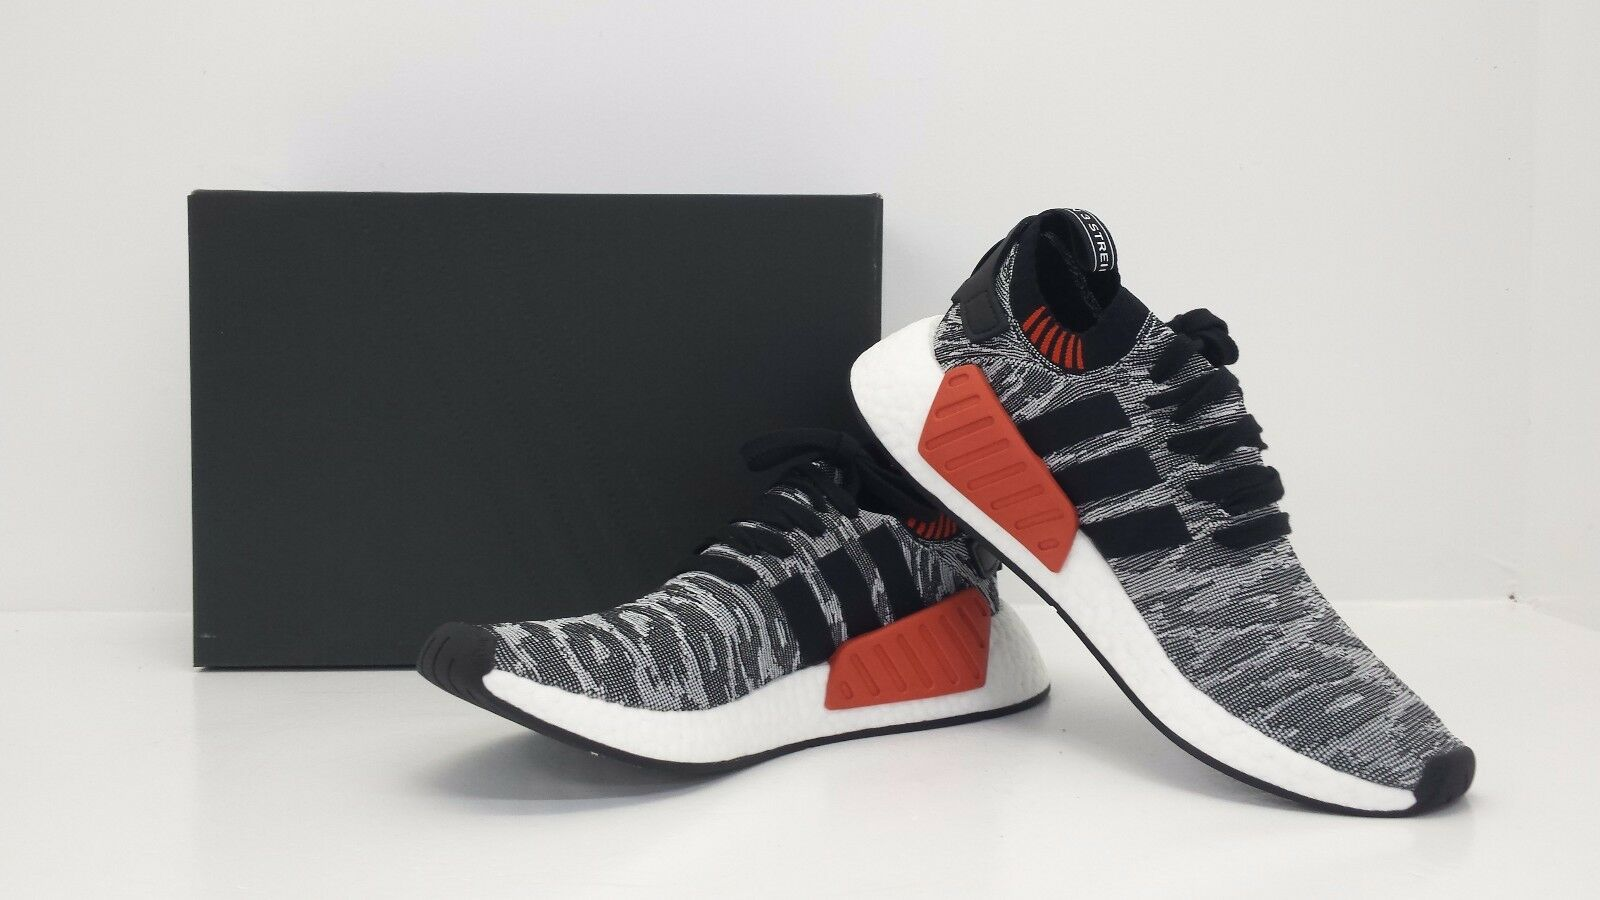 Adidas nmd_r2 PK Core by9409 Negro / blanco / rojo by9409 Core comodo 510677